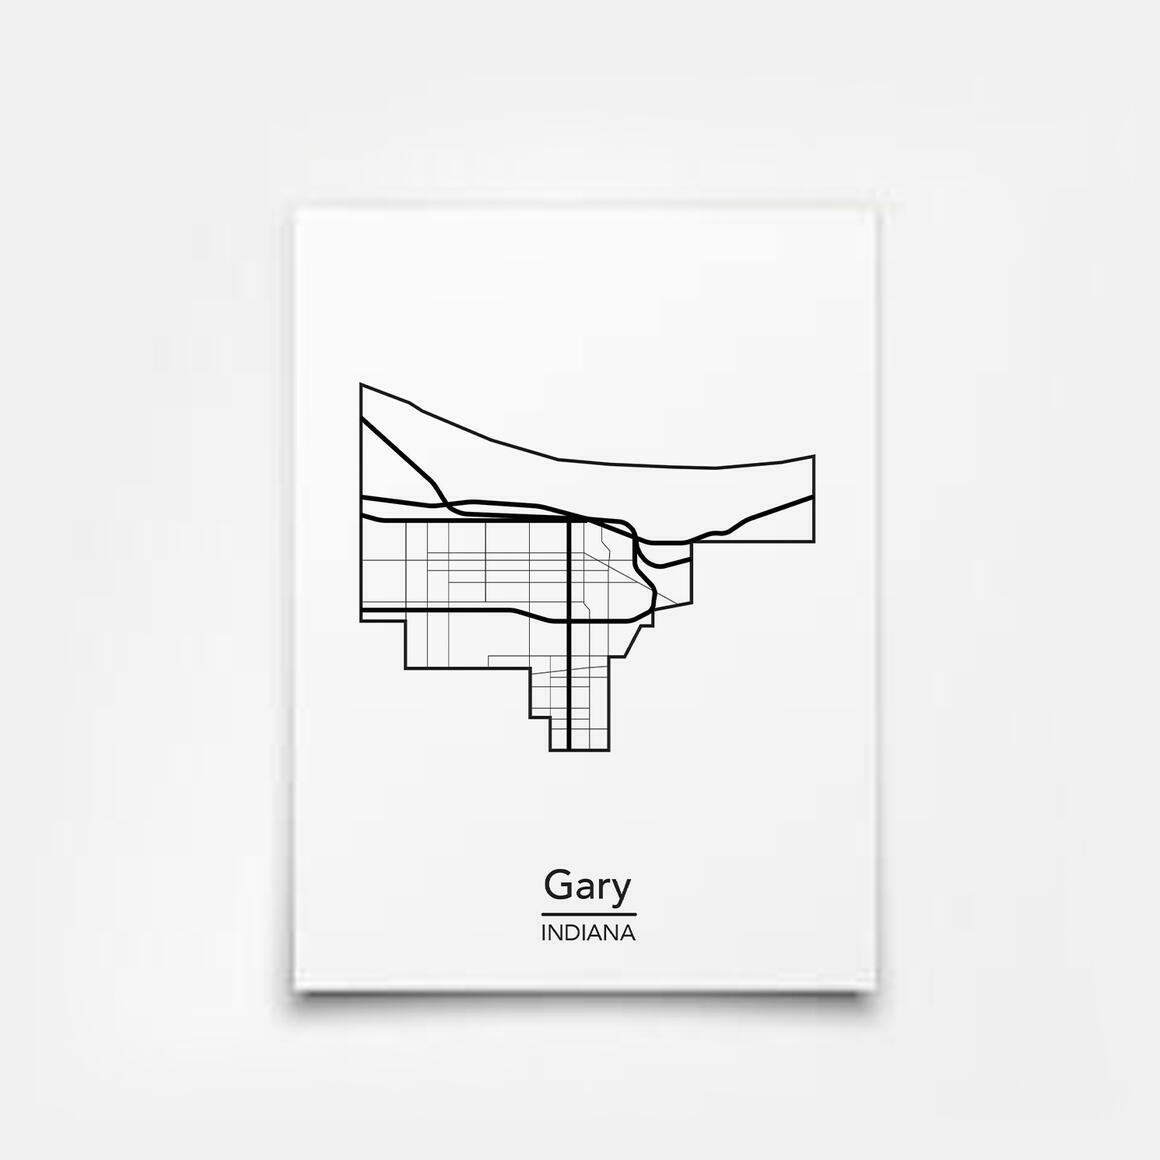 Gary, Indiana City Map Print   Trada Marketplace